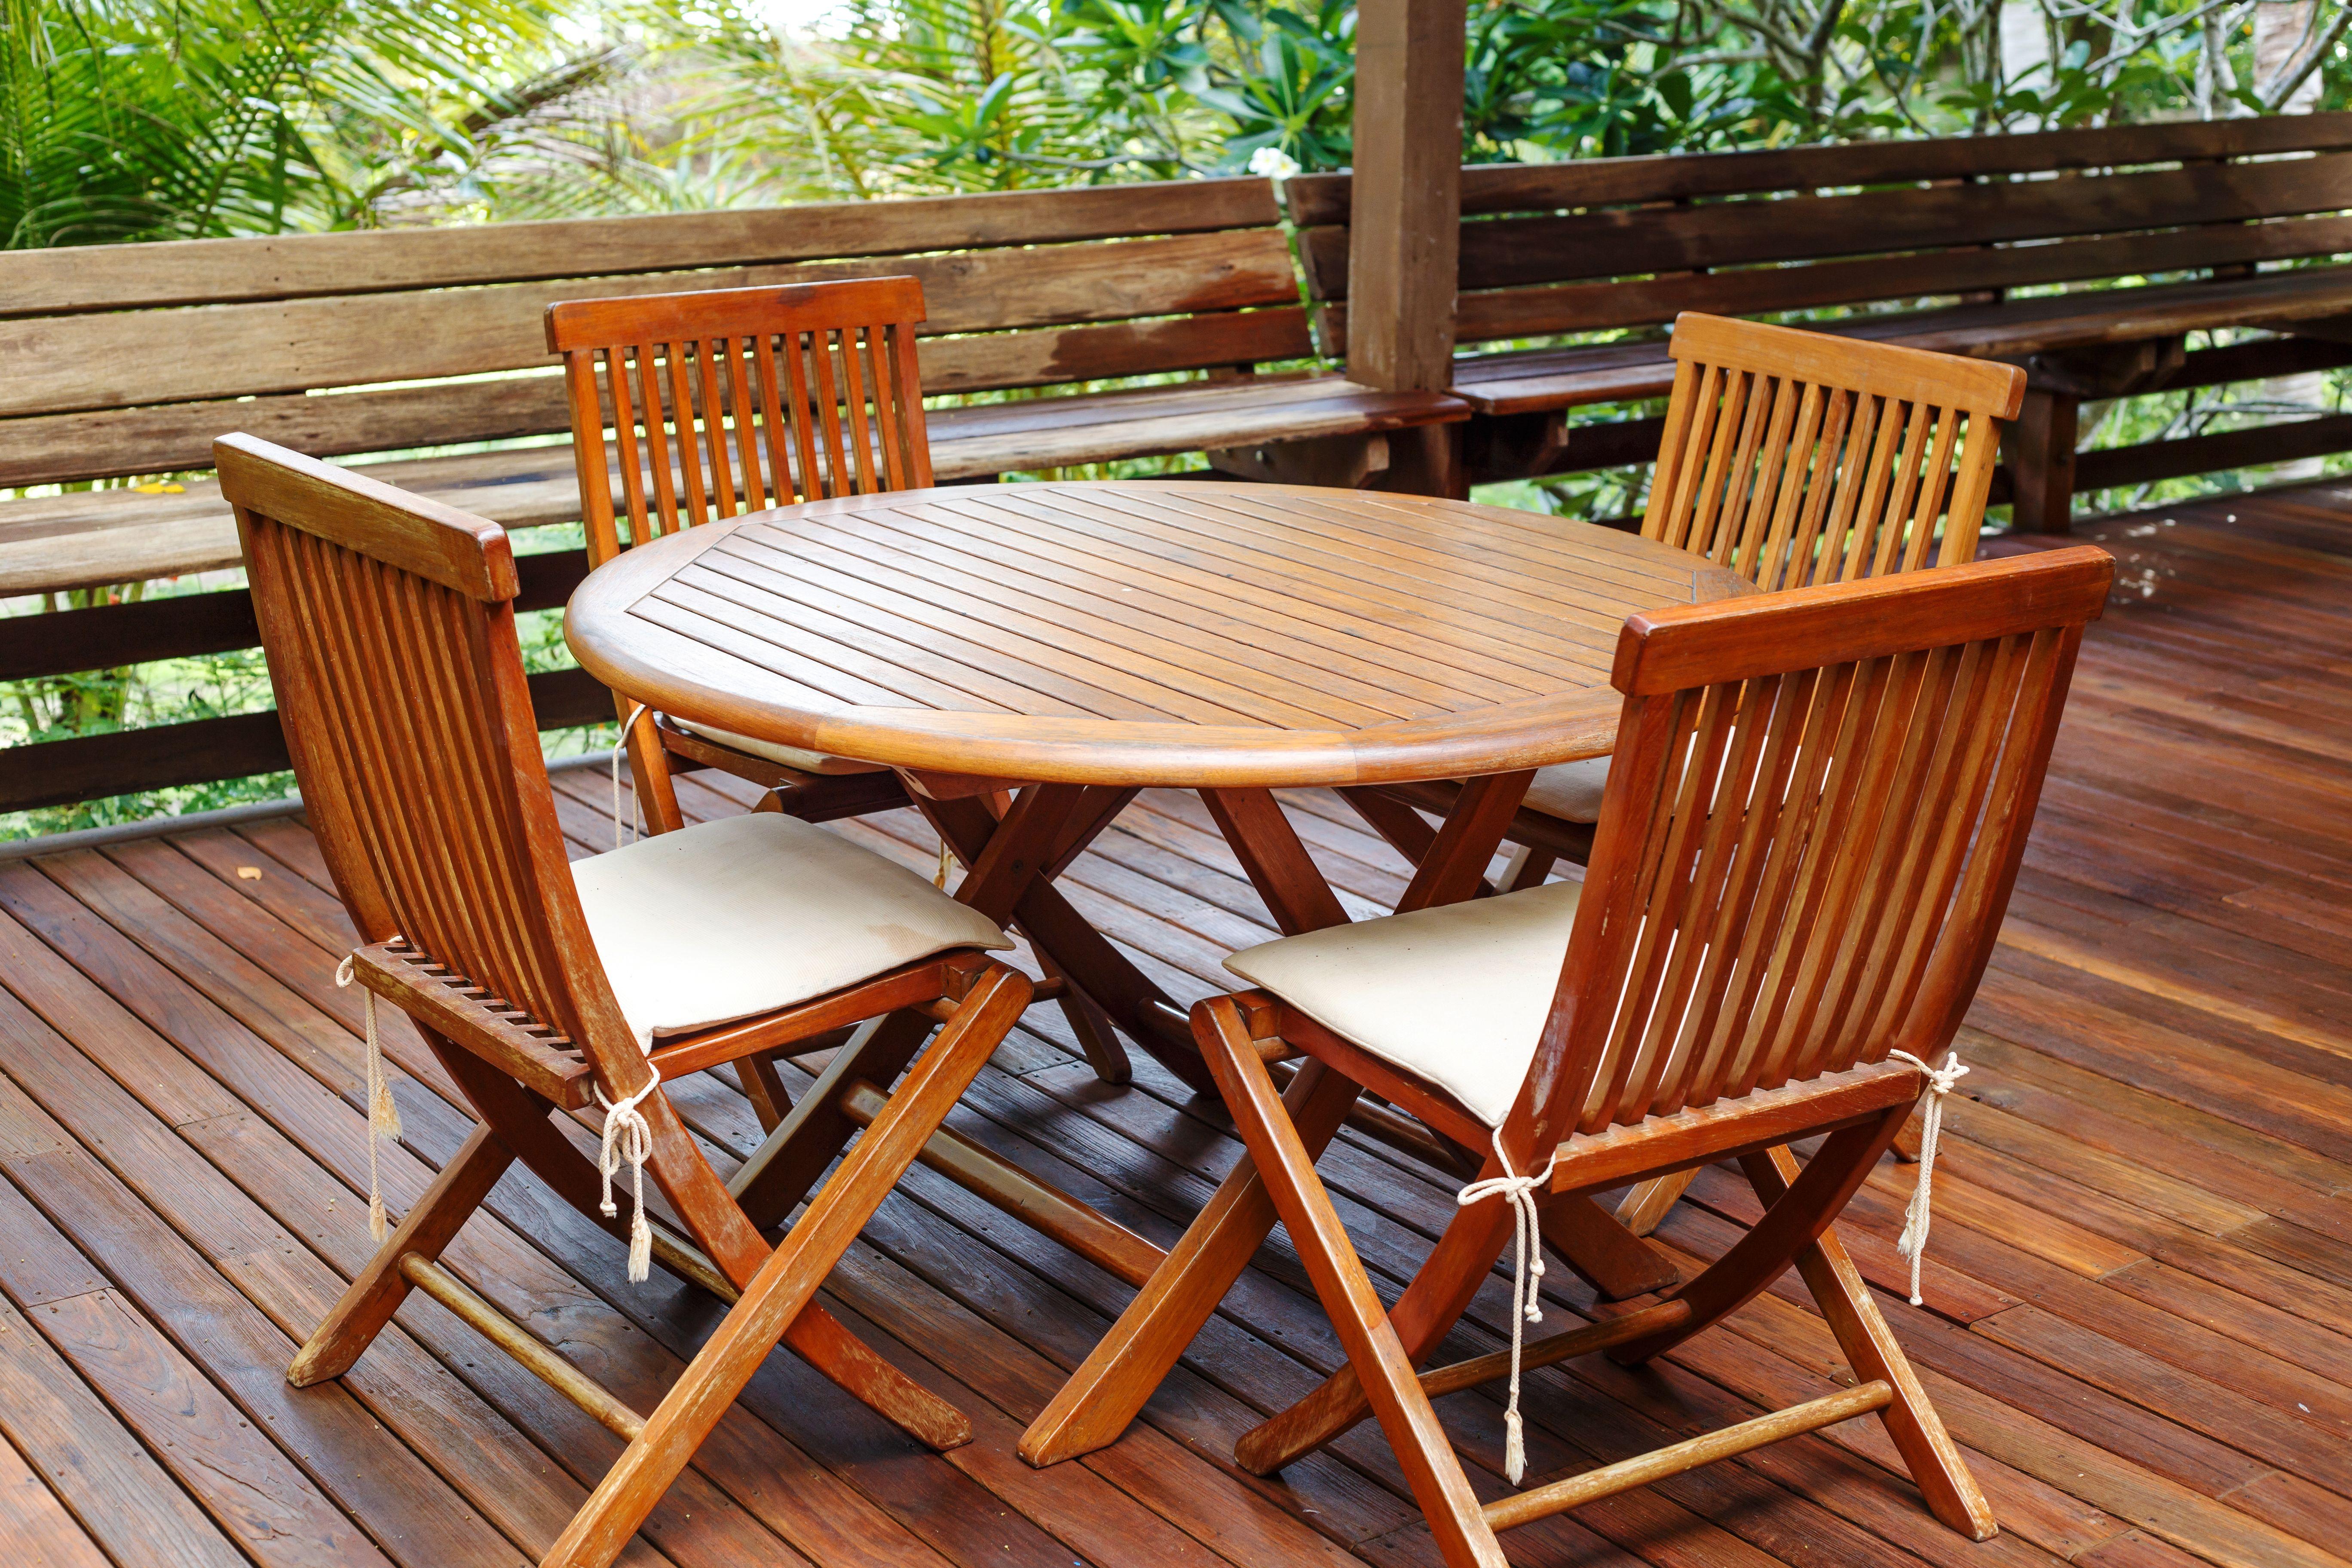 How To Stain Teak Furniture Hunker Teak Patio Furniture Teak Wood Furniture Teak Furniture